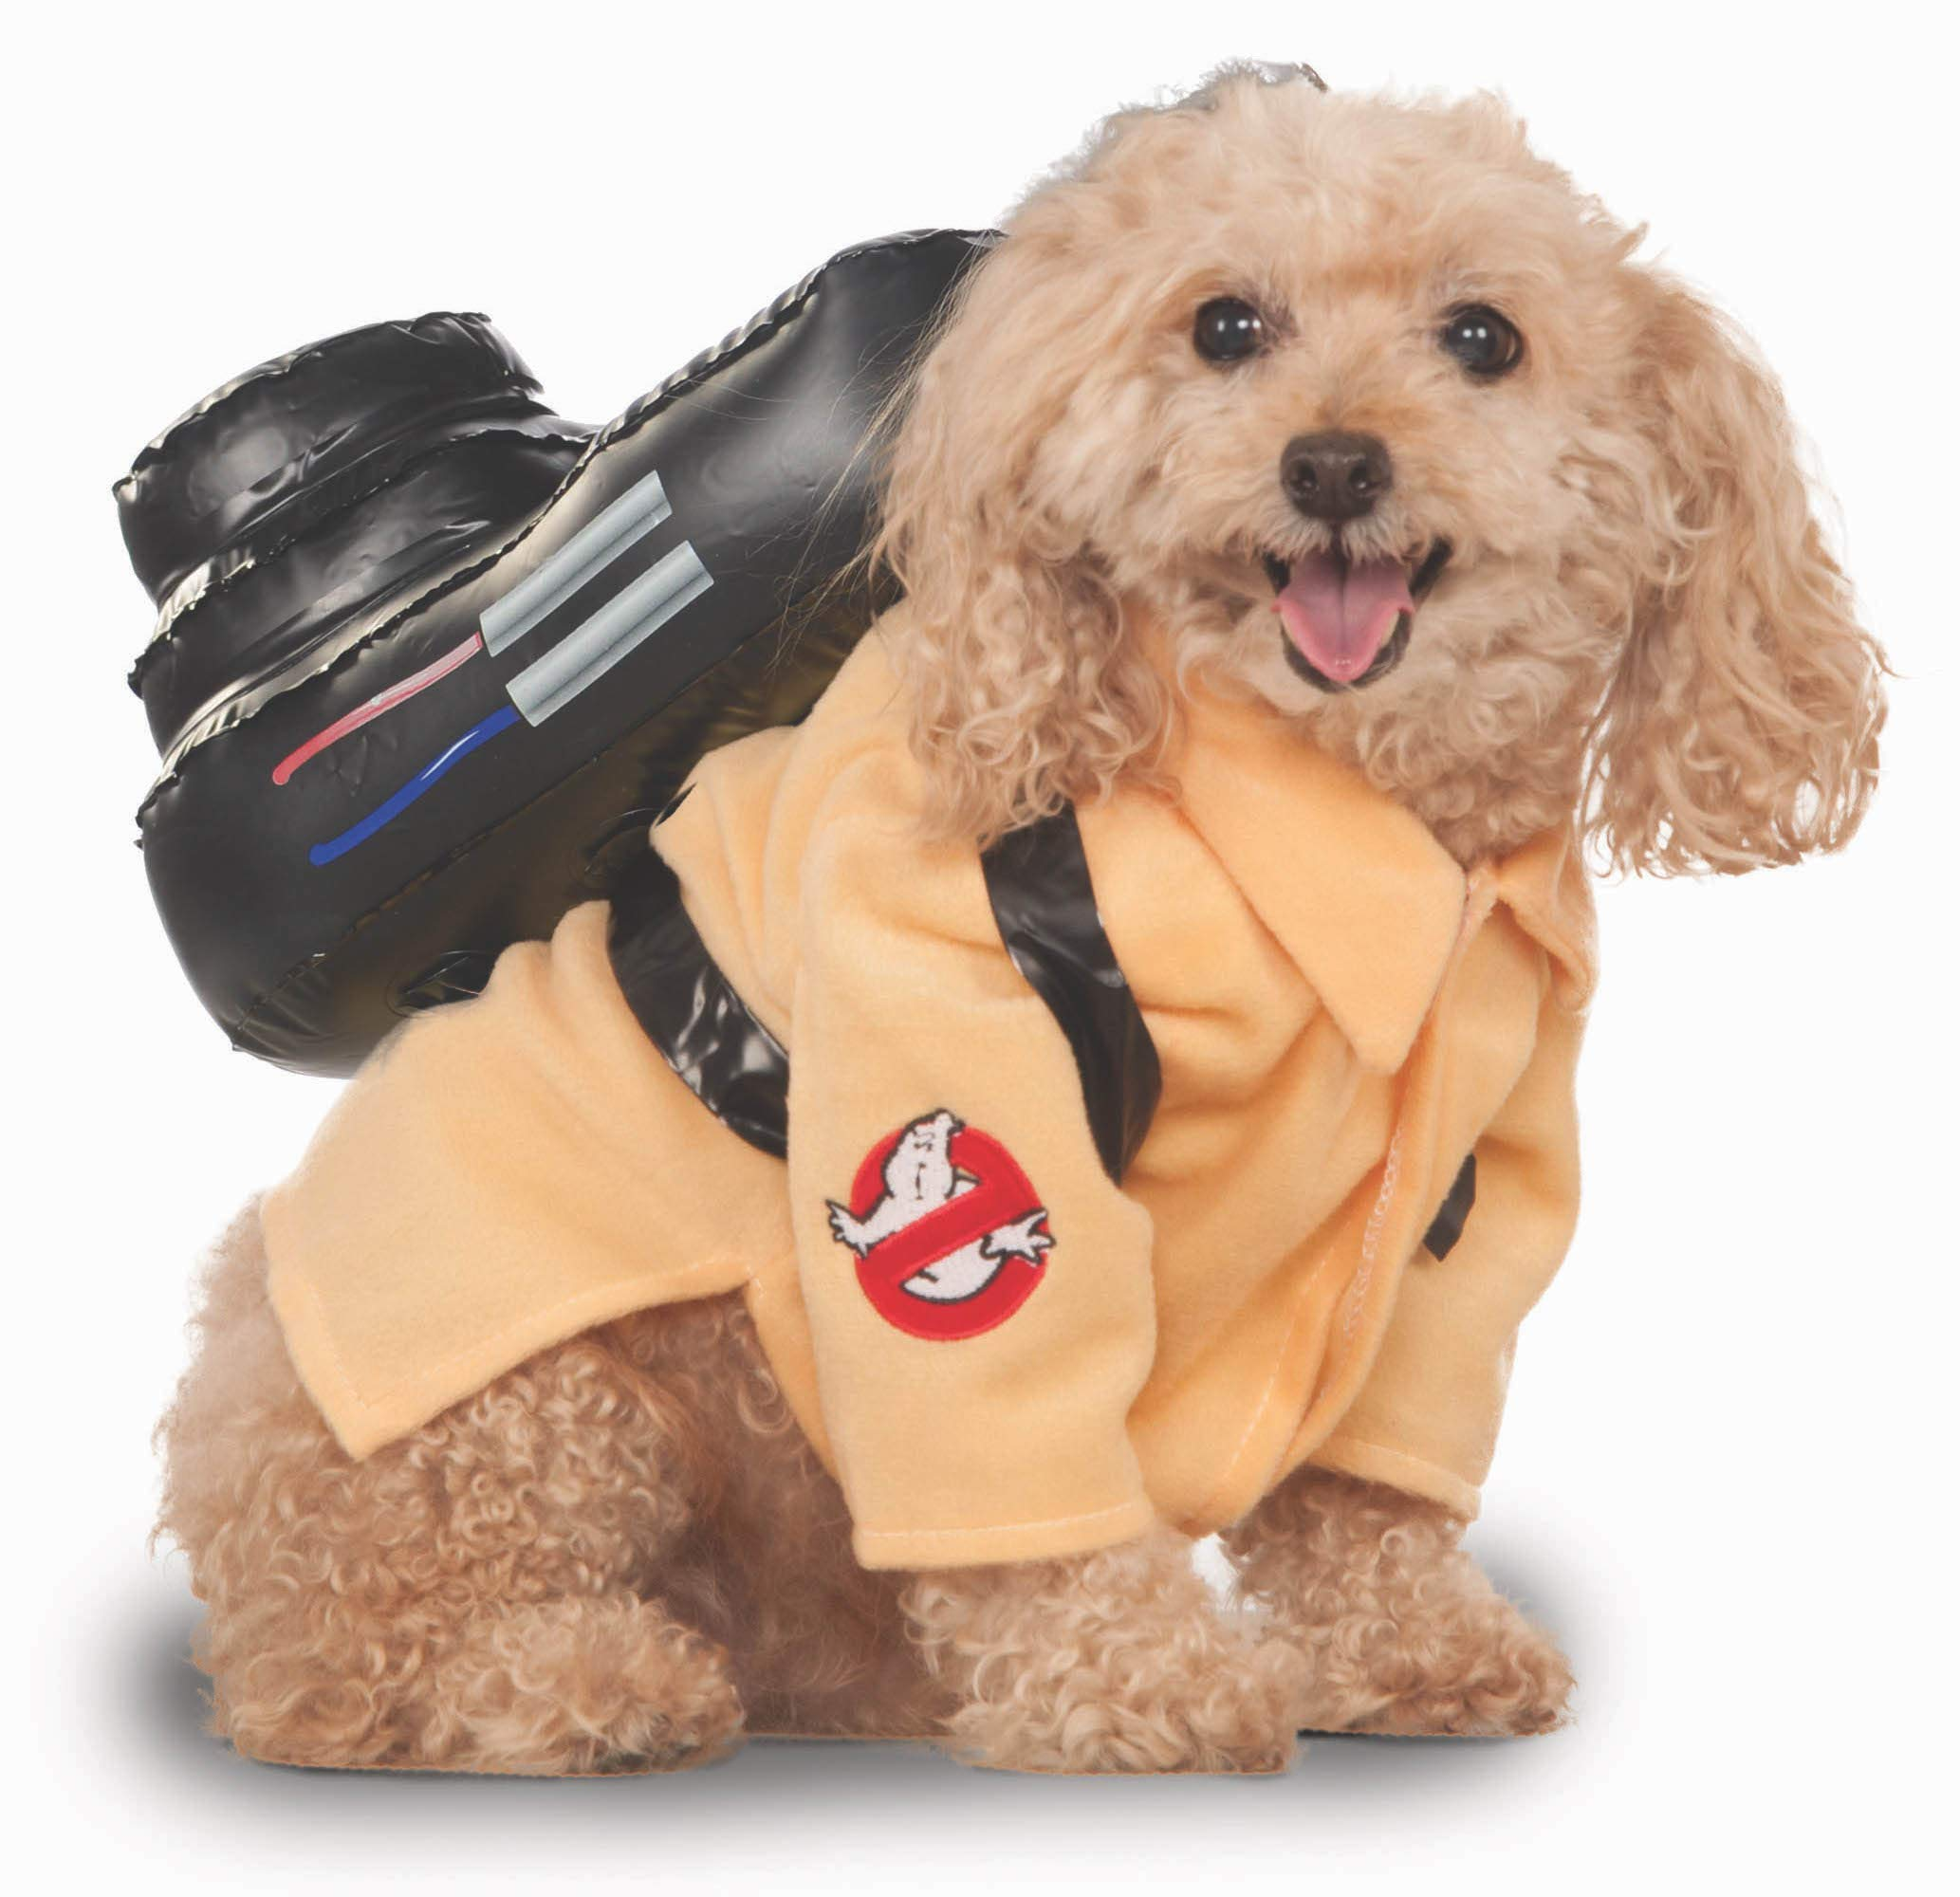 Rubie's Ghostbusters Movie Pet Costume, X-Large, Ghostbuster Jumpsuit